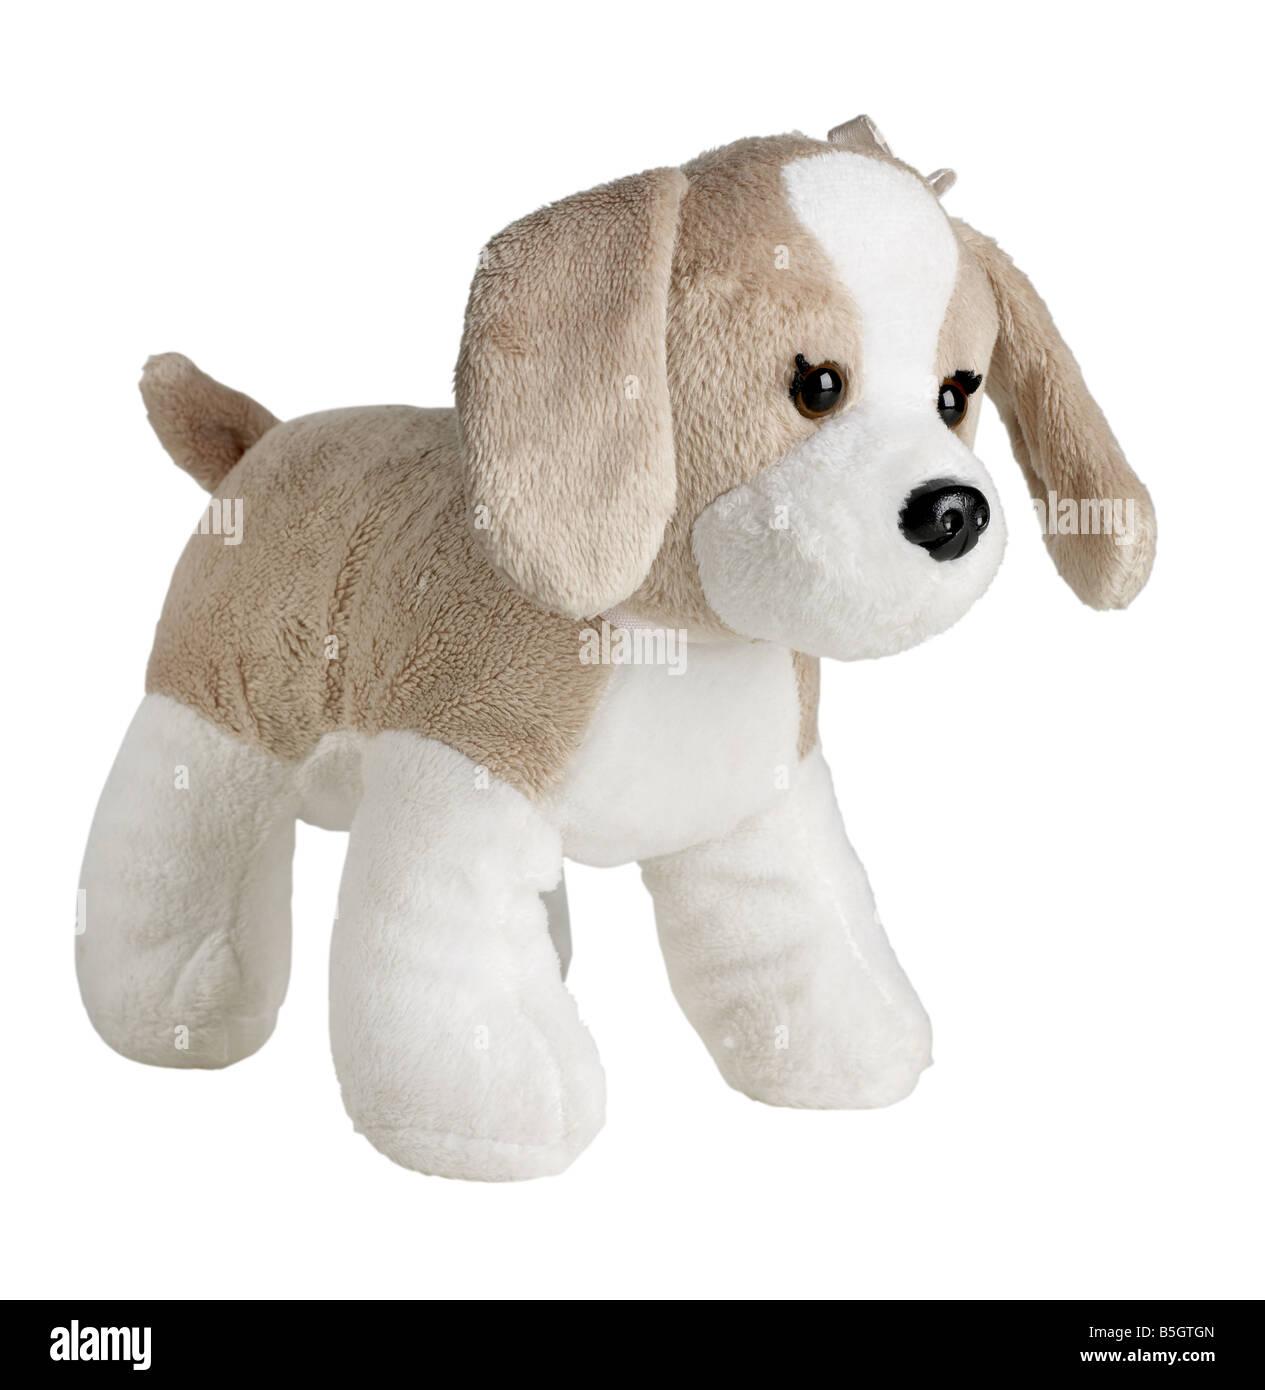 Tan and White Stuffed animal - Stock Image